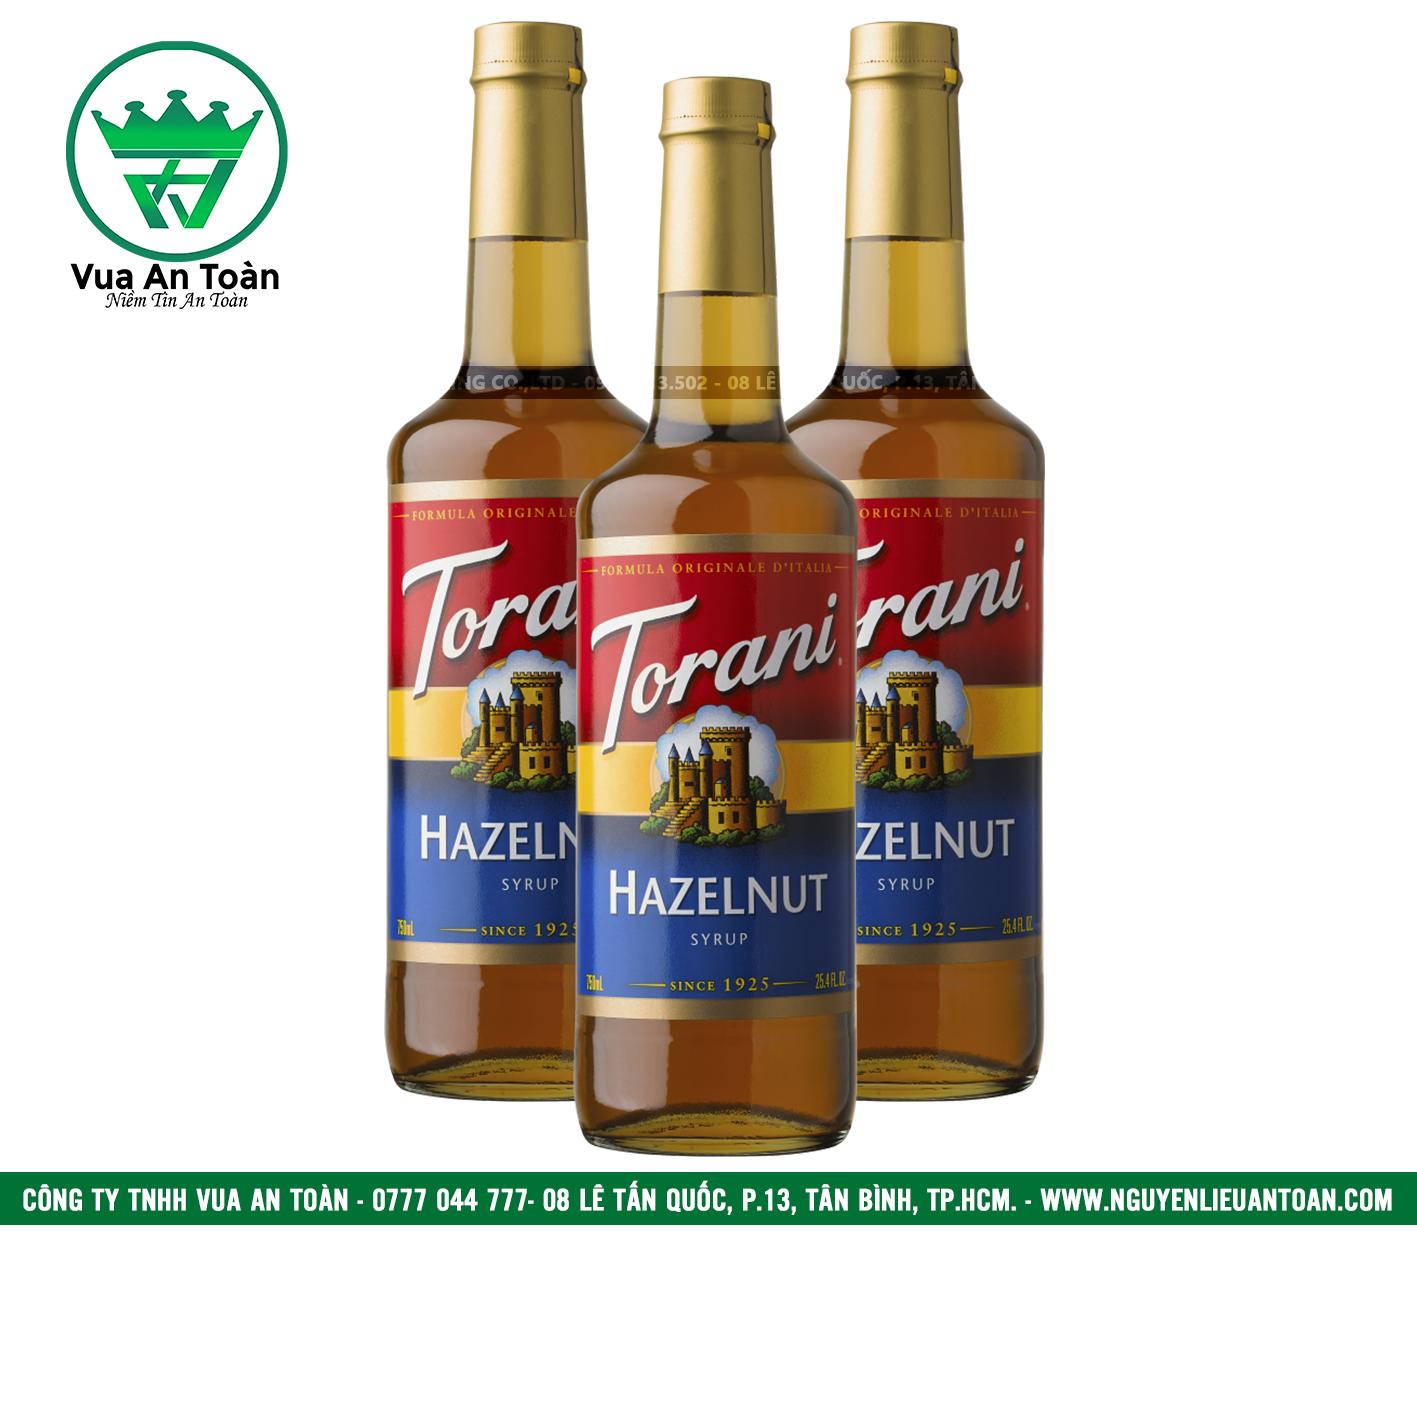 Torani Hạt Dẻ - Hazelnut Syrup